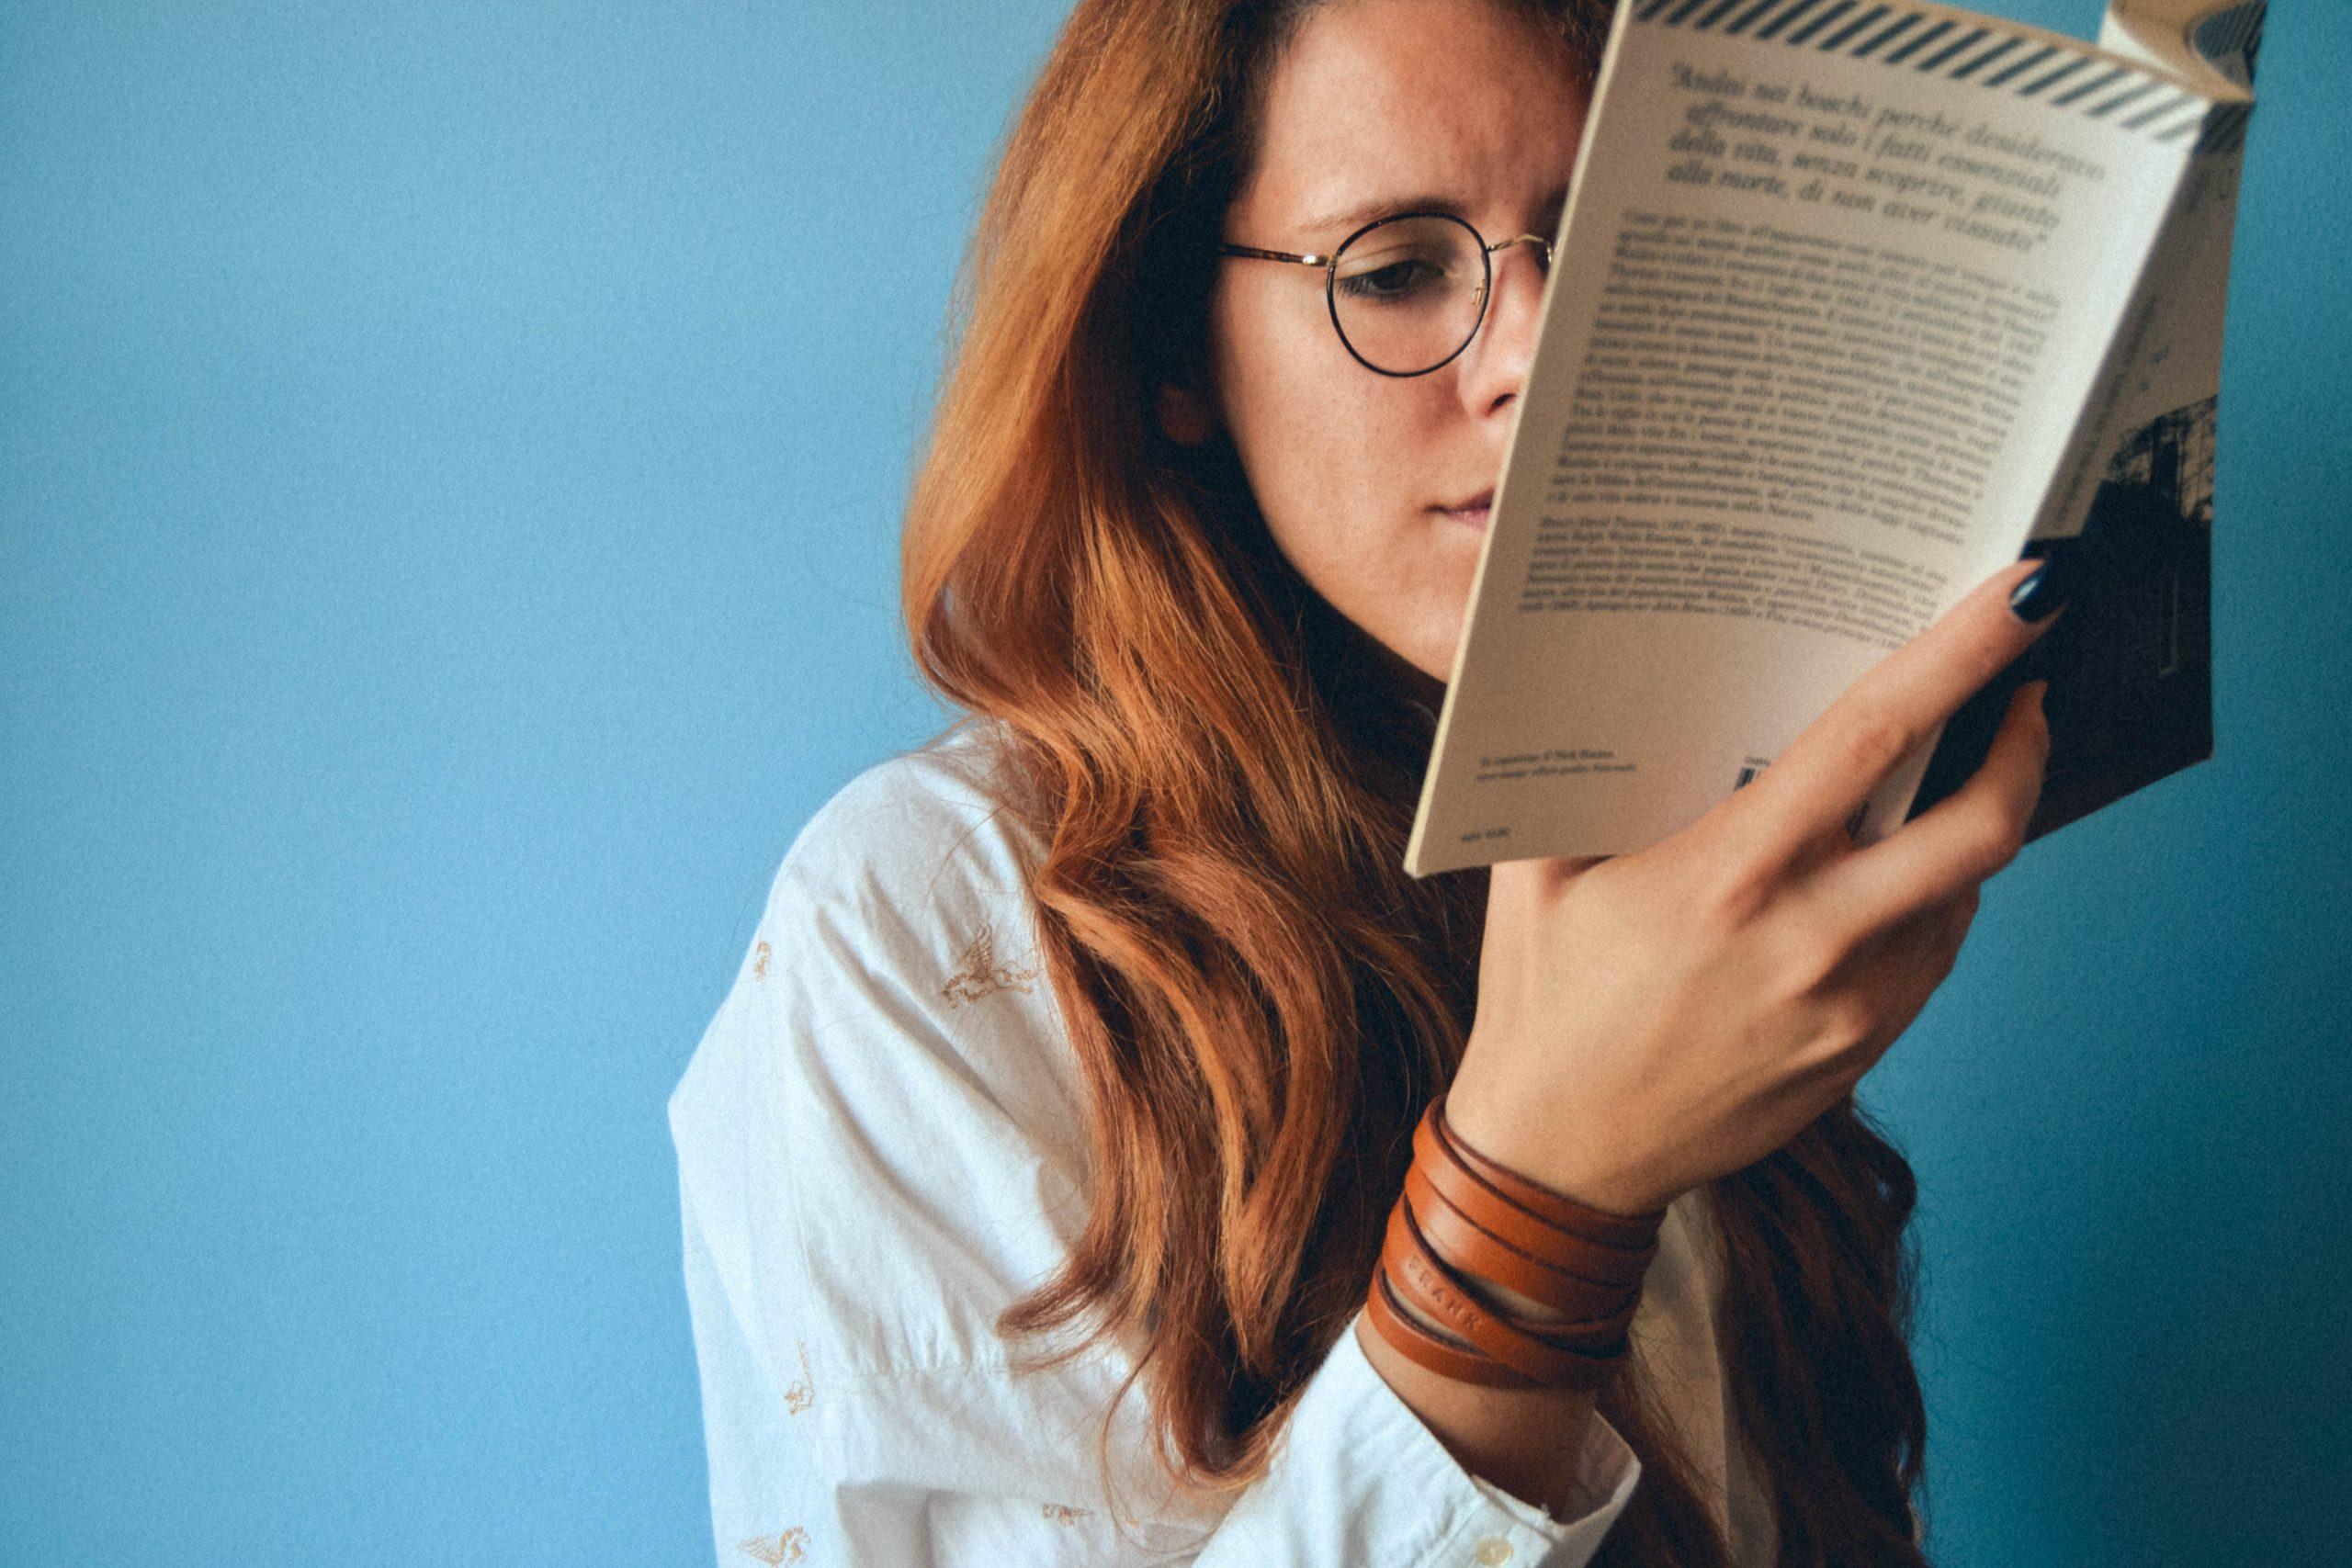 Mujer leyendo un libro sobre pared azul